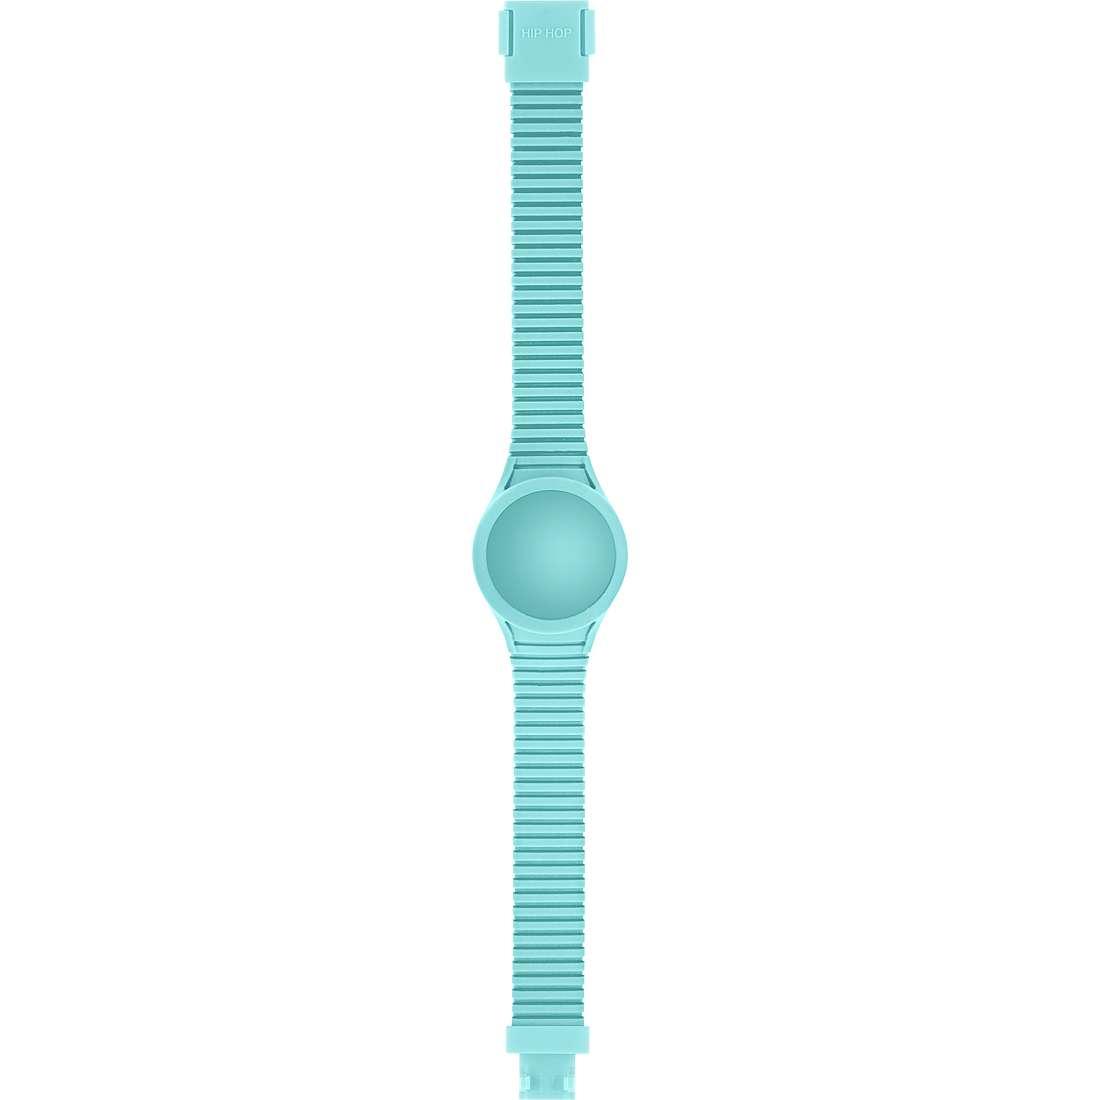 orologio accessorio unisex Hip Hop Solar HBU0535